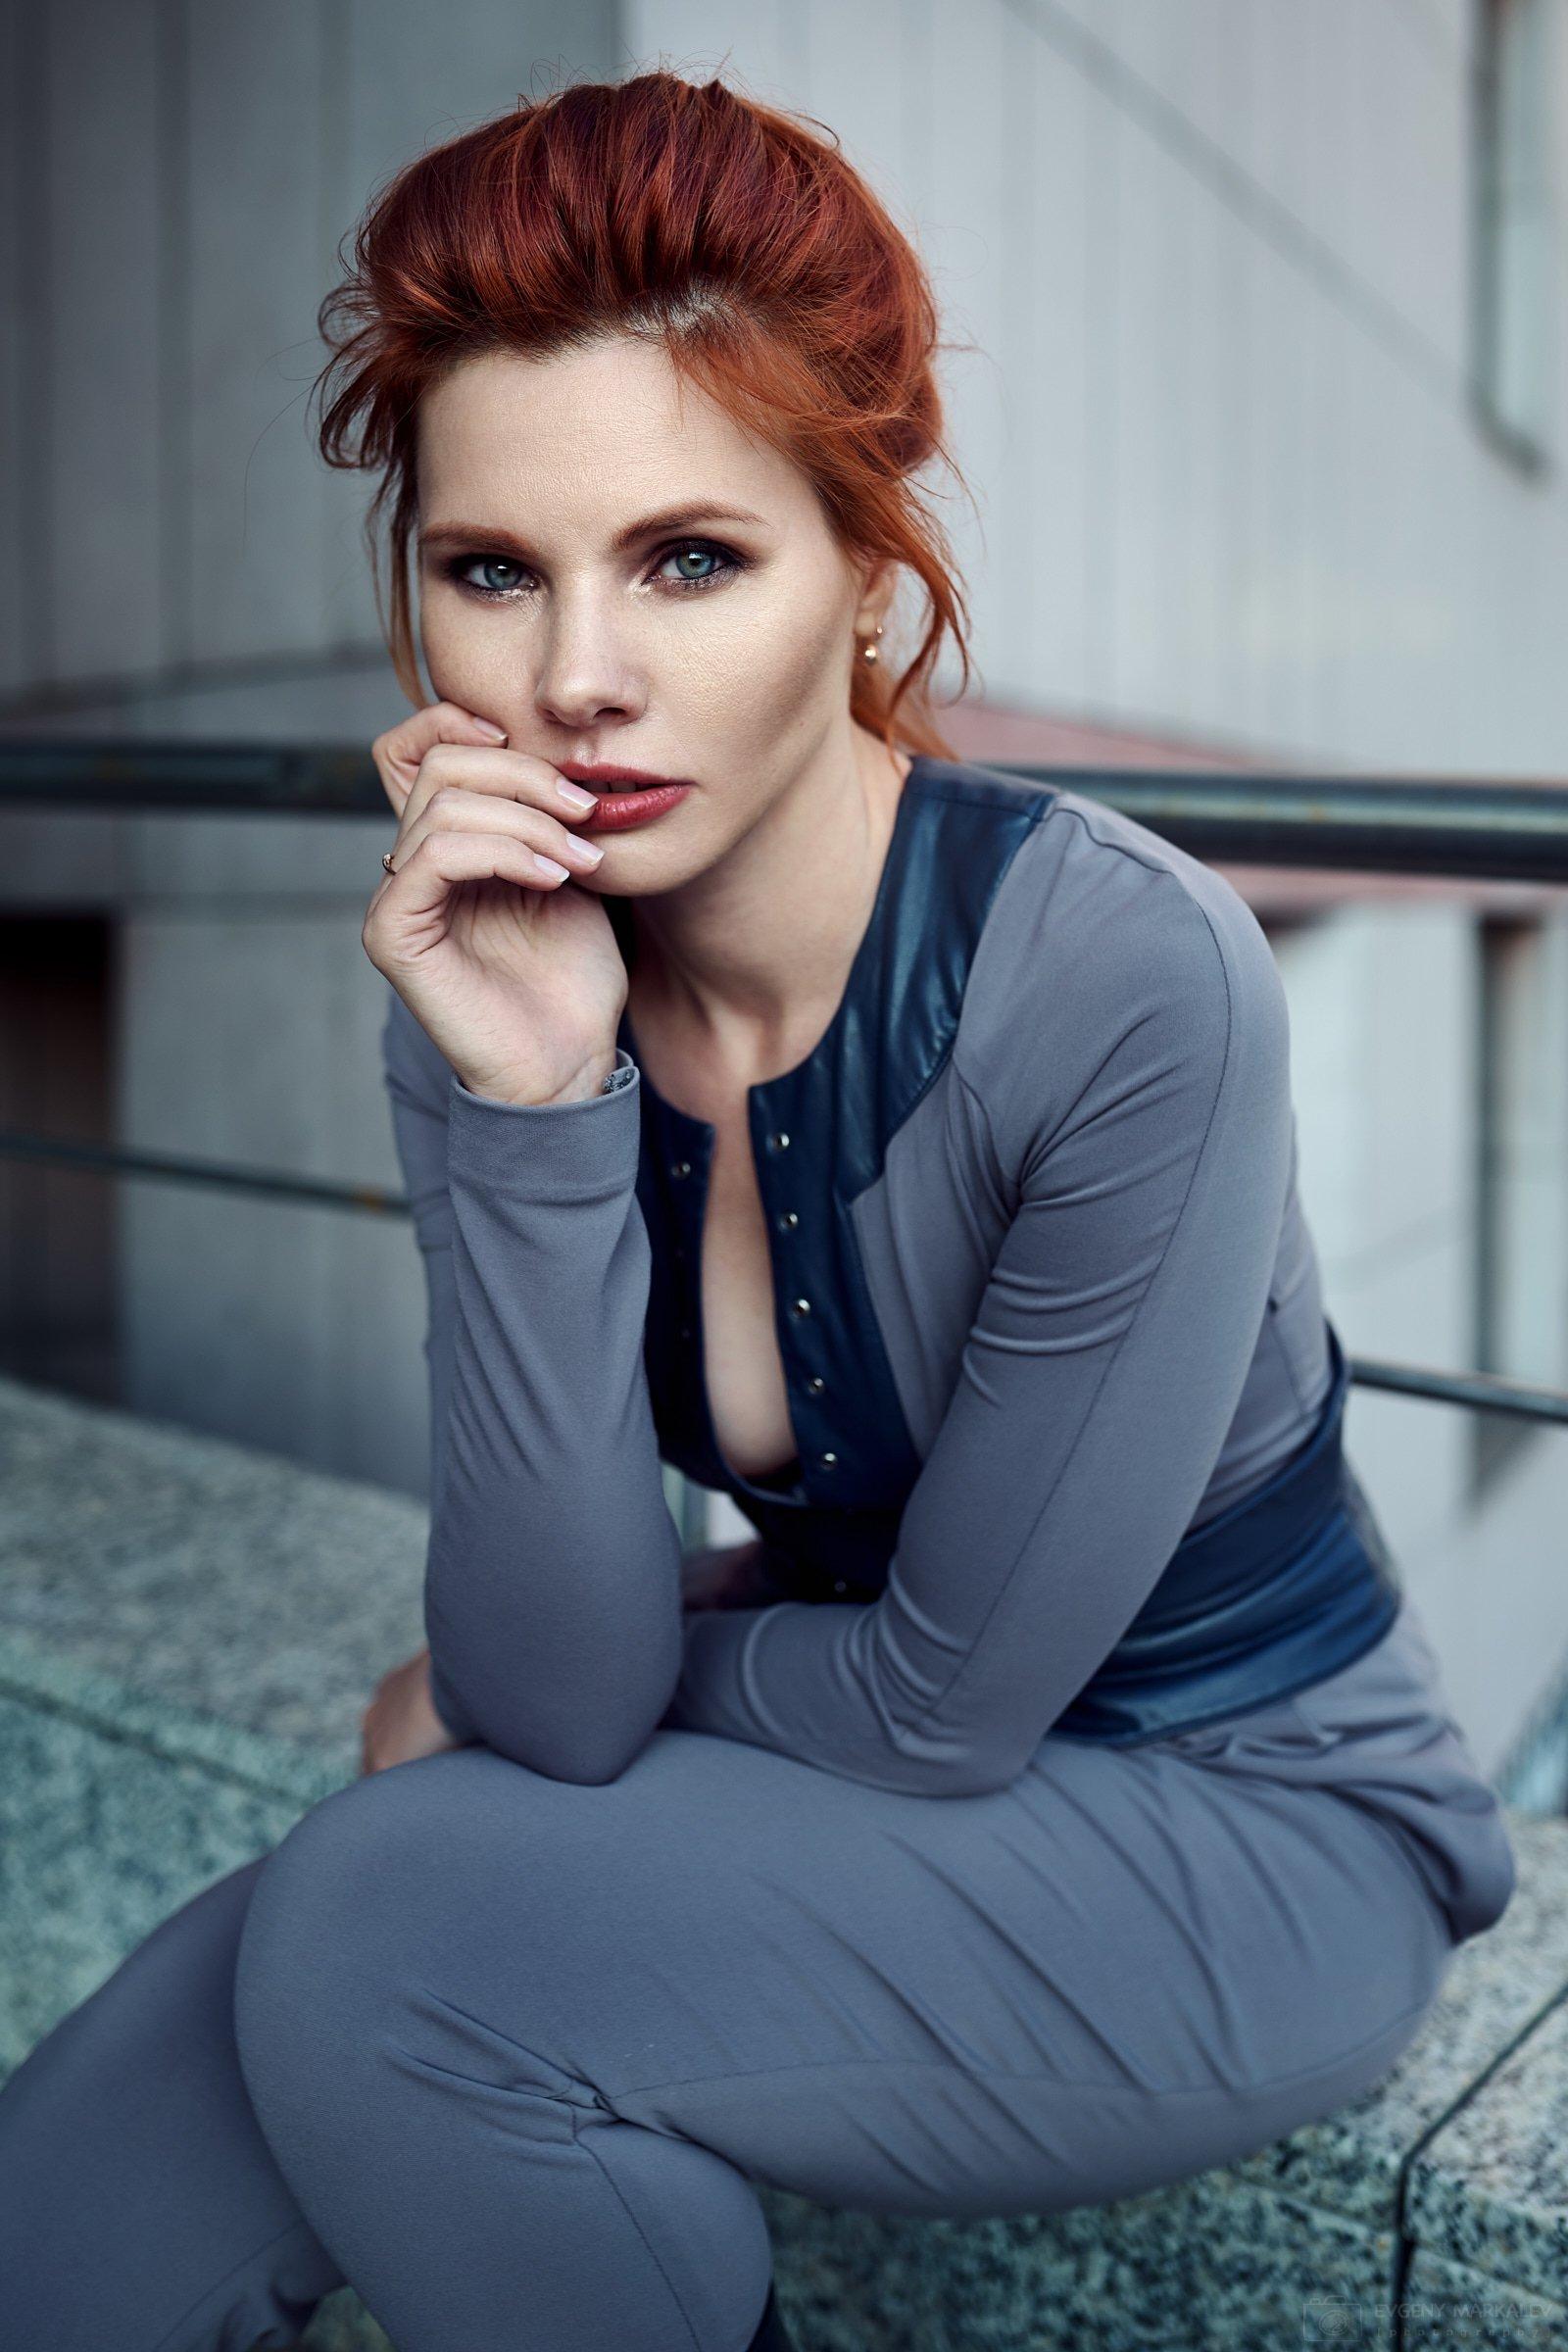 woman, girl, natural light, outdoors, Евгений Маркалев